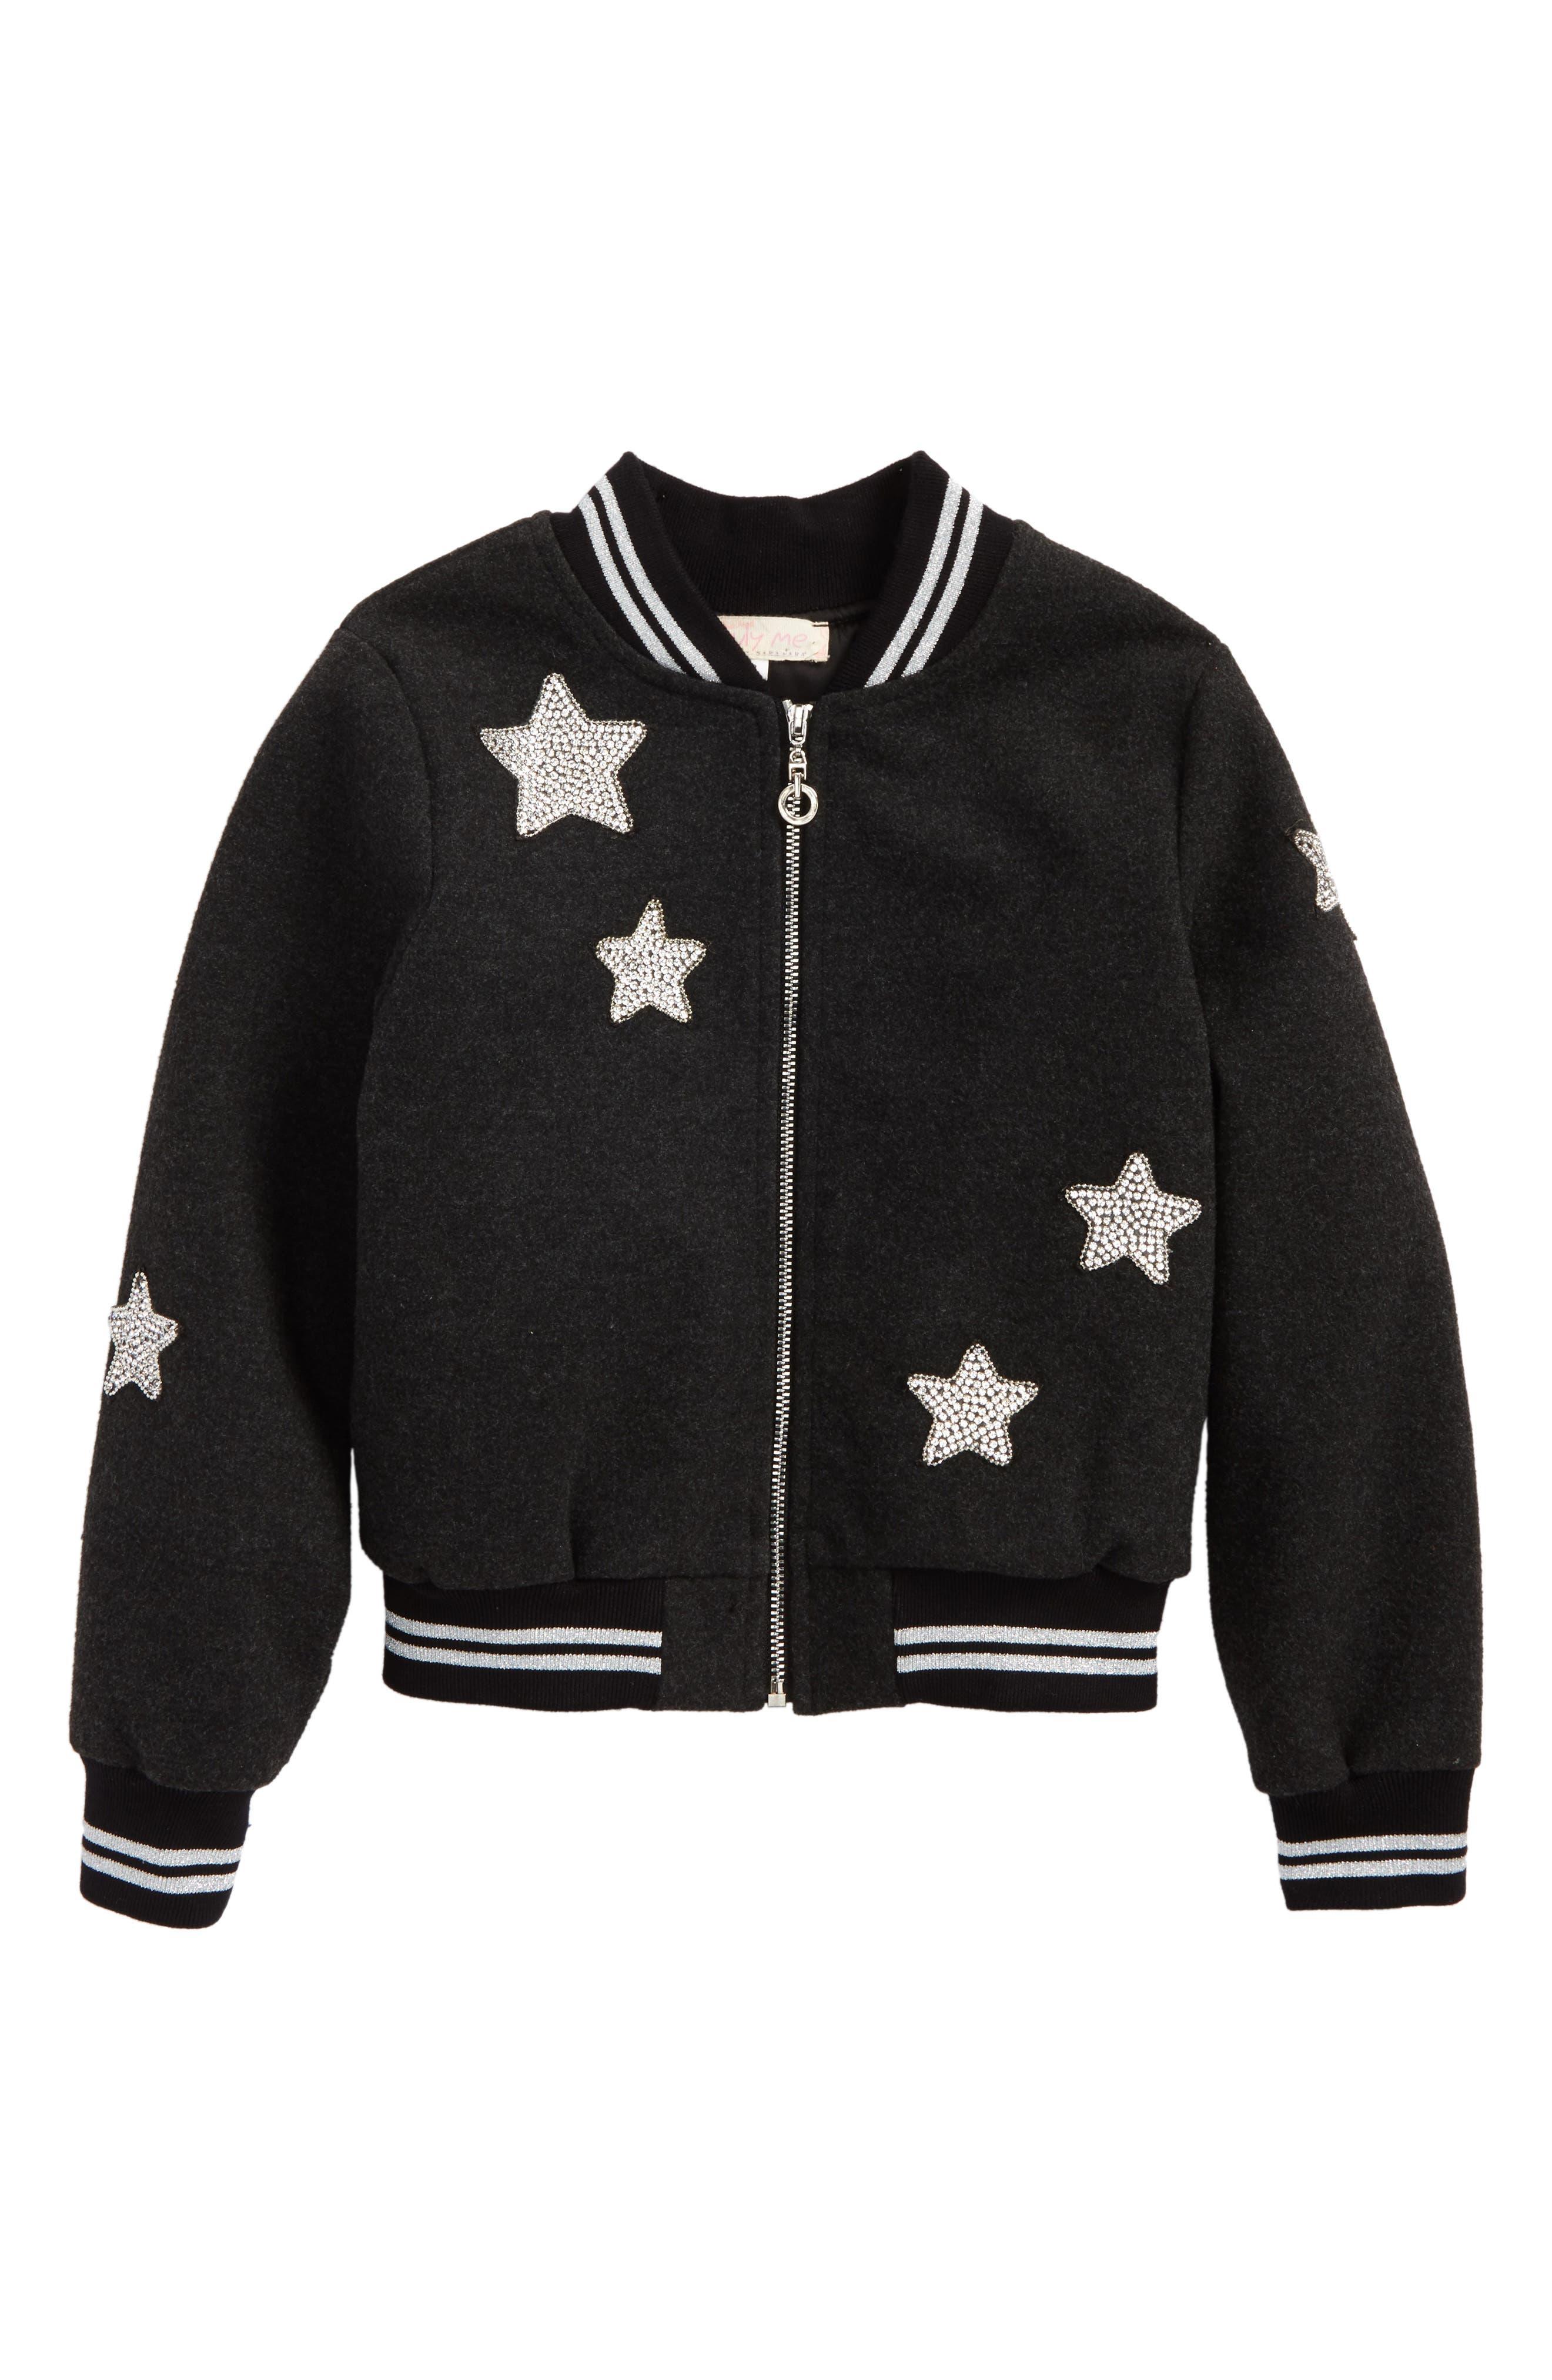 Star Patch Bomber Jacket,                         Main,                         color, Black